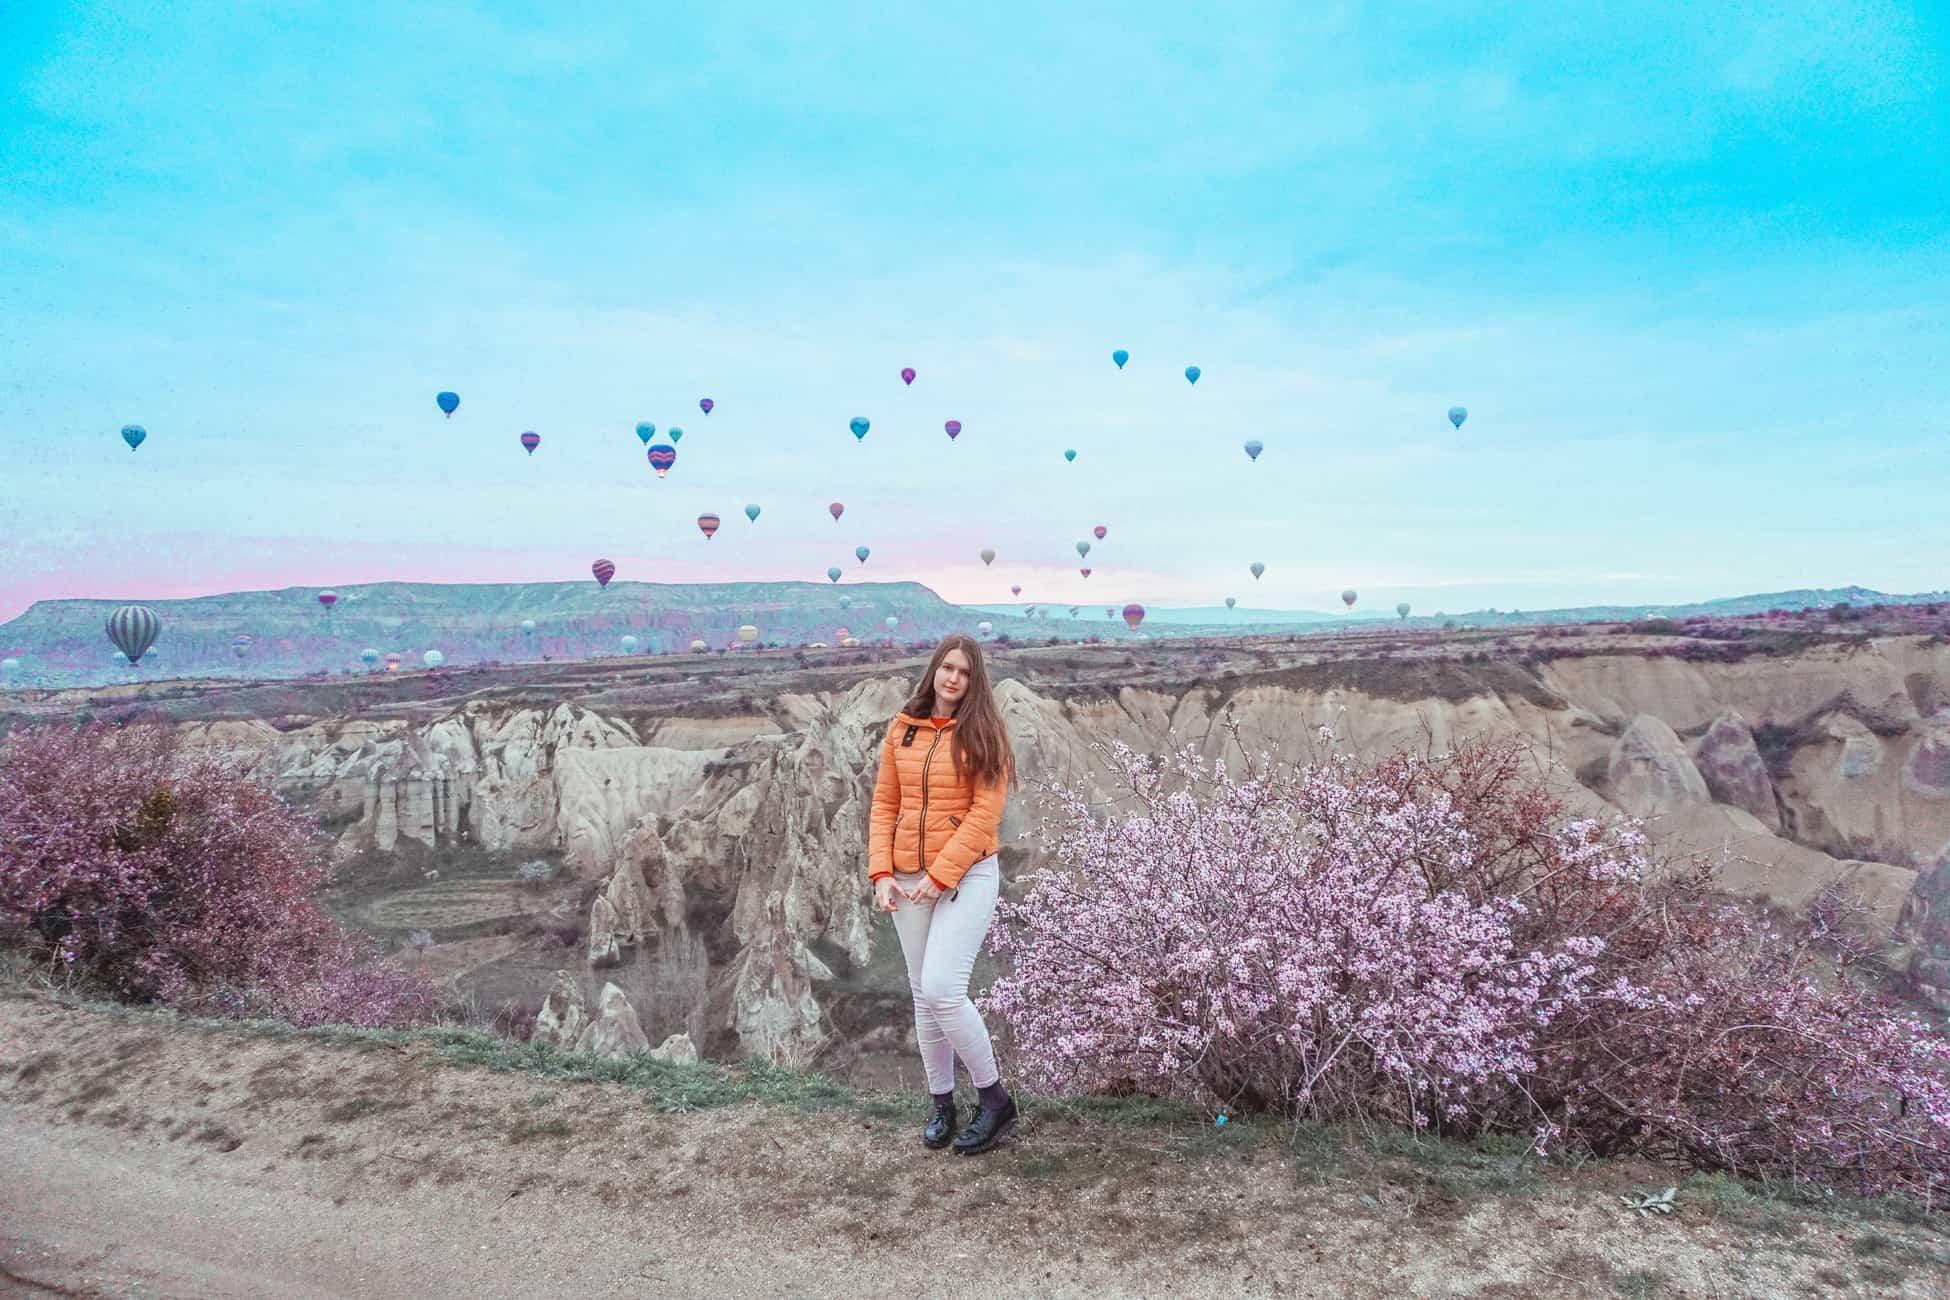 4 days in Turkey - Istanbul and Cappadocia